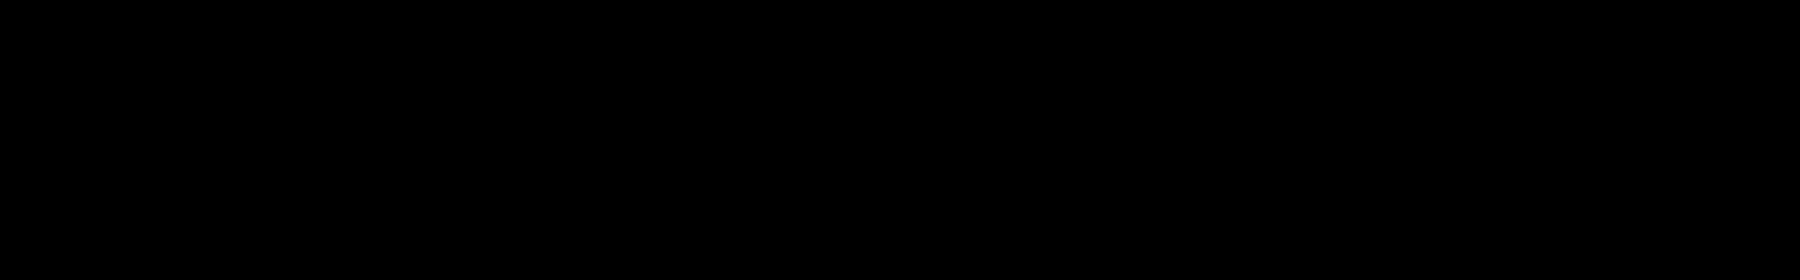 HARDLINE - Serum Presets audio waveform